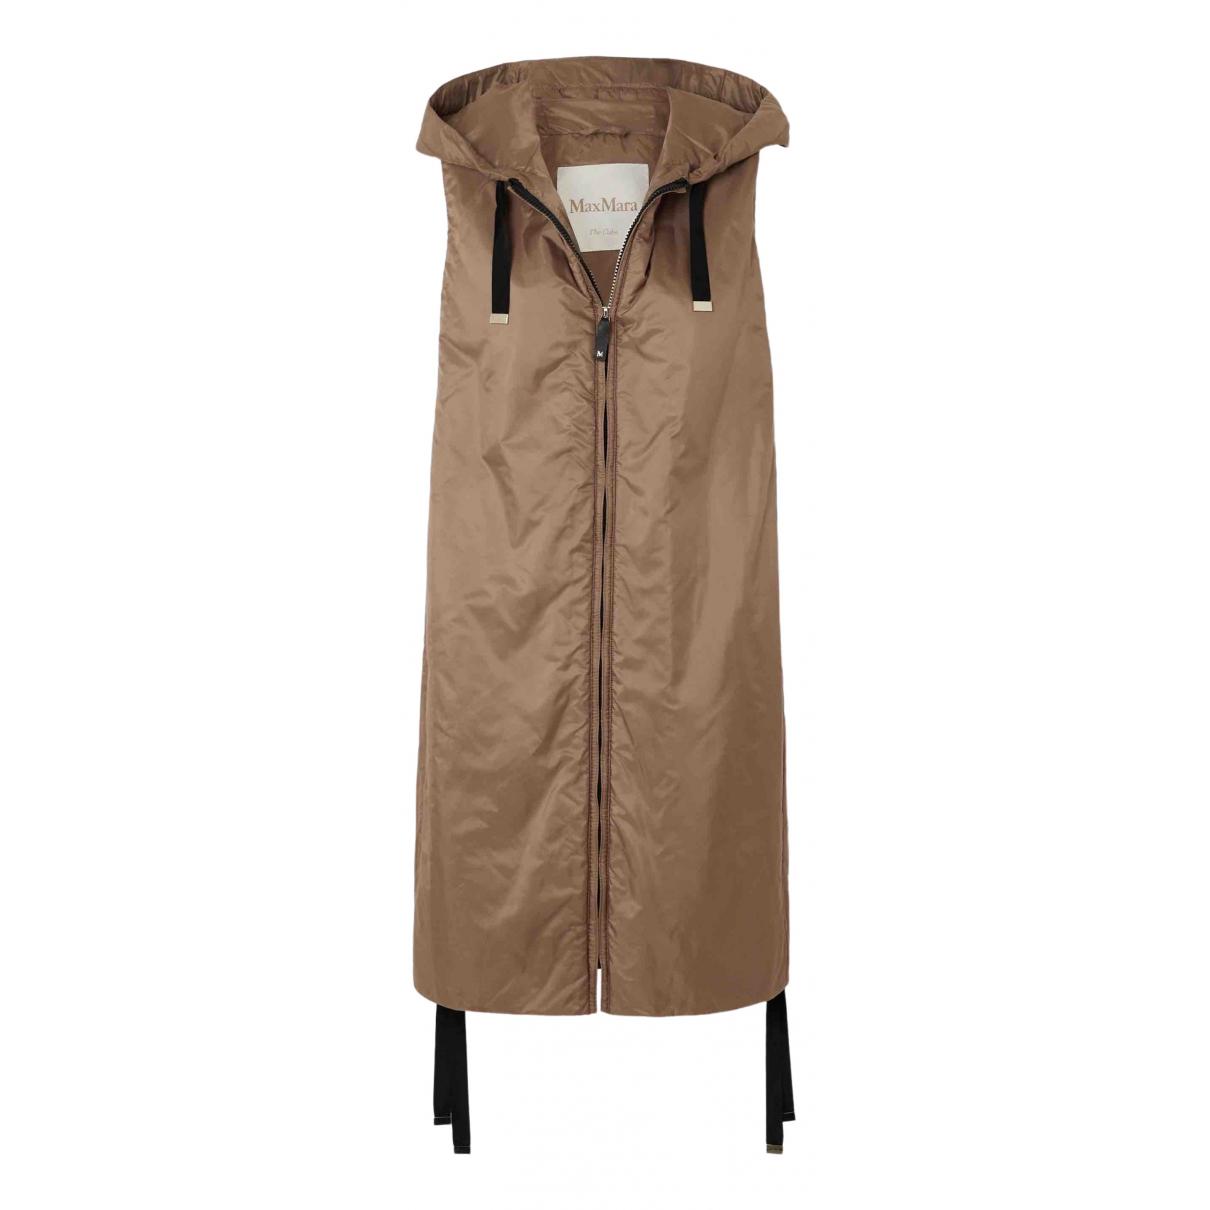 Max Mara \N Camel coat for Women 44 IT